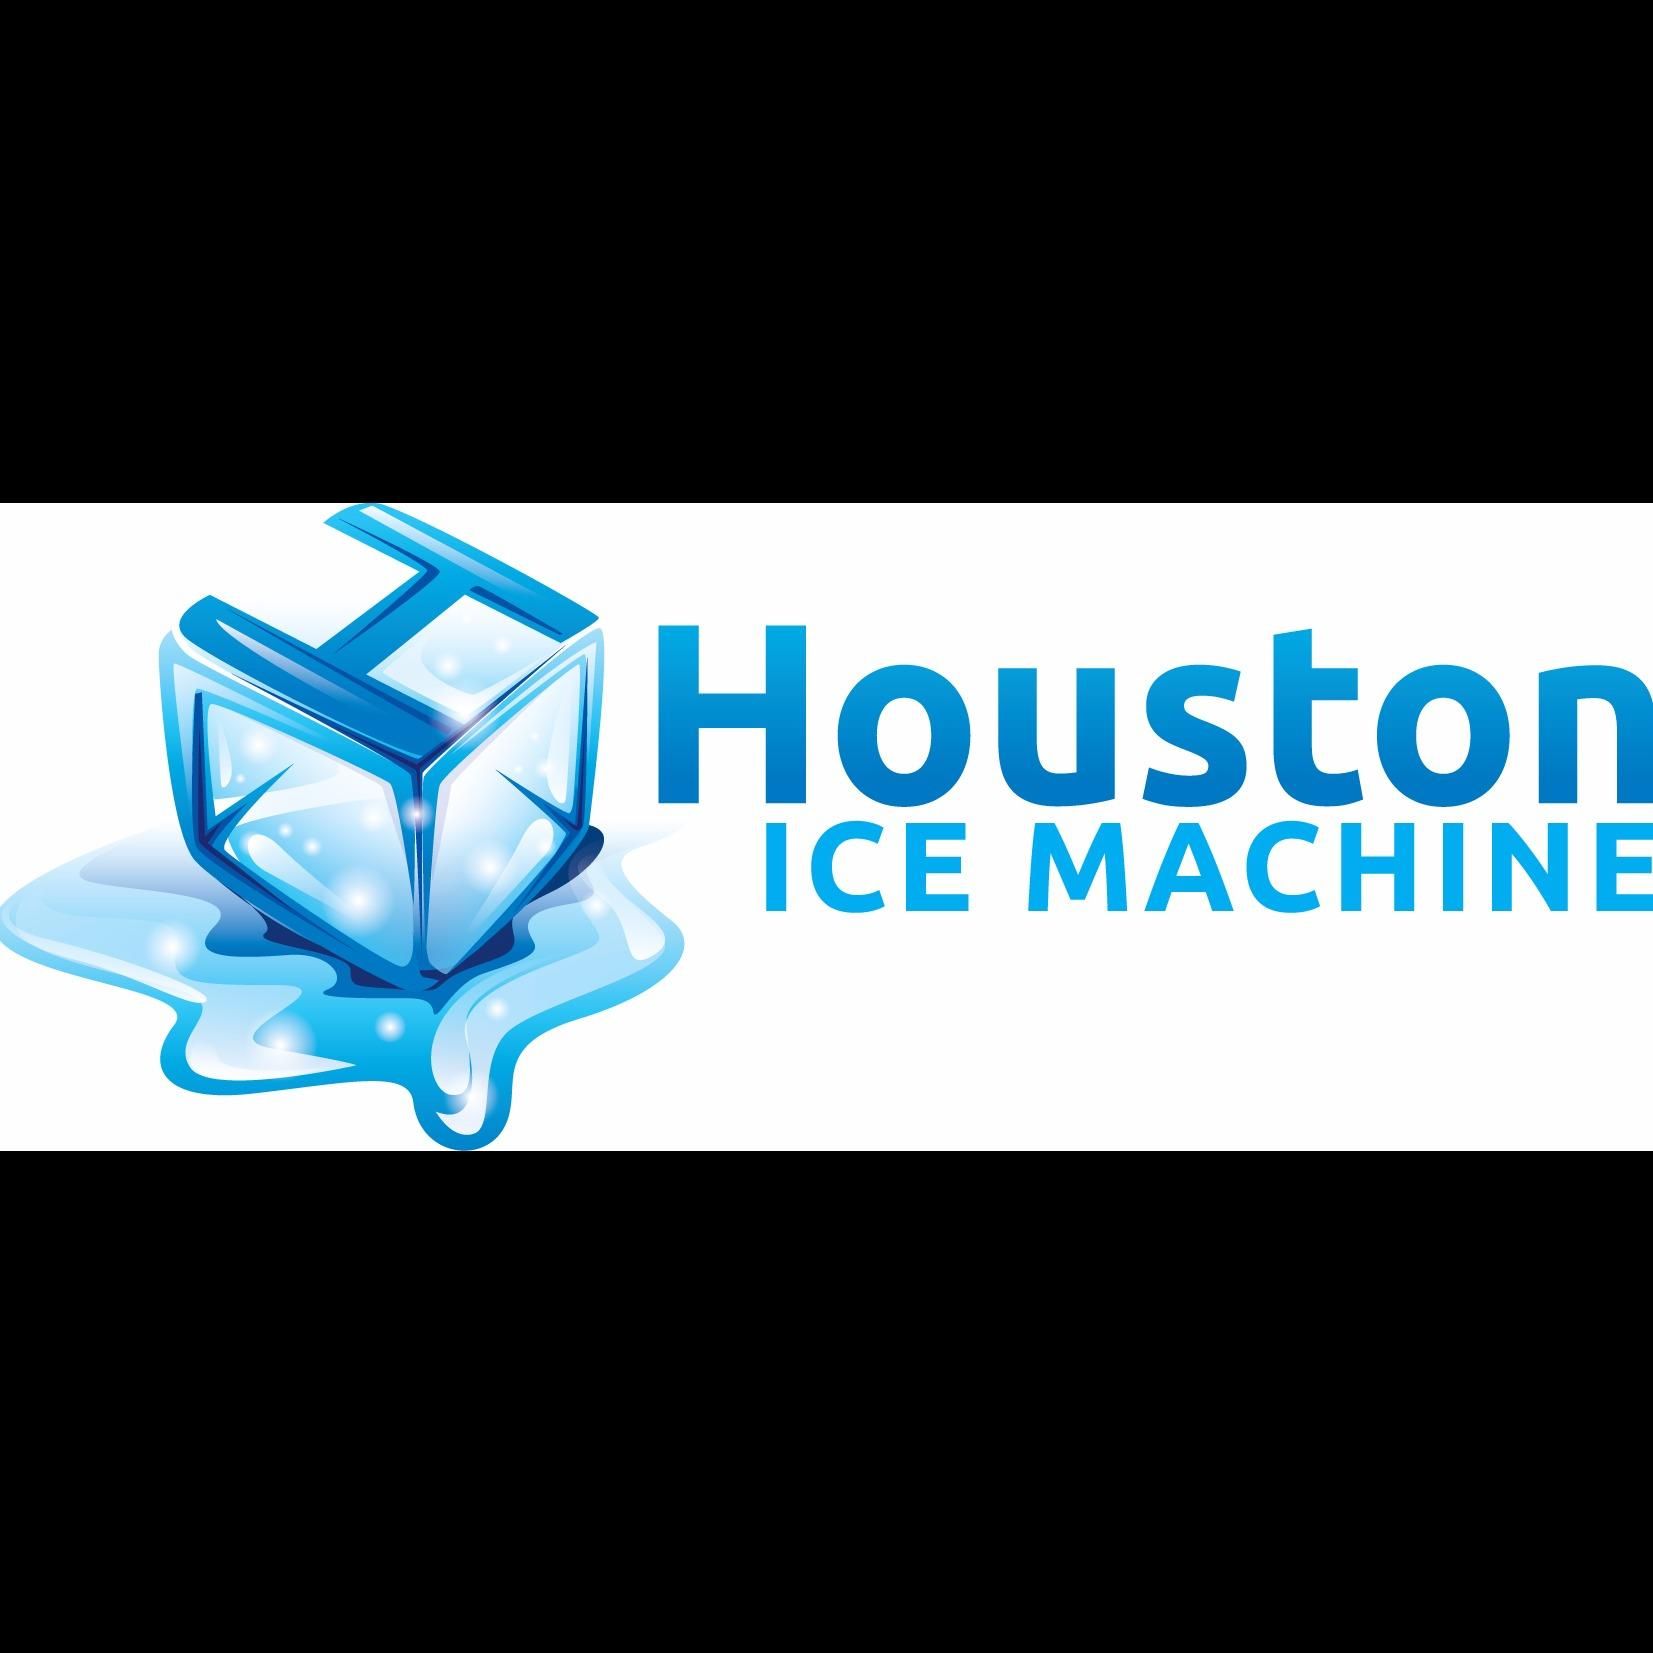 Houston Ice Machine